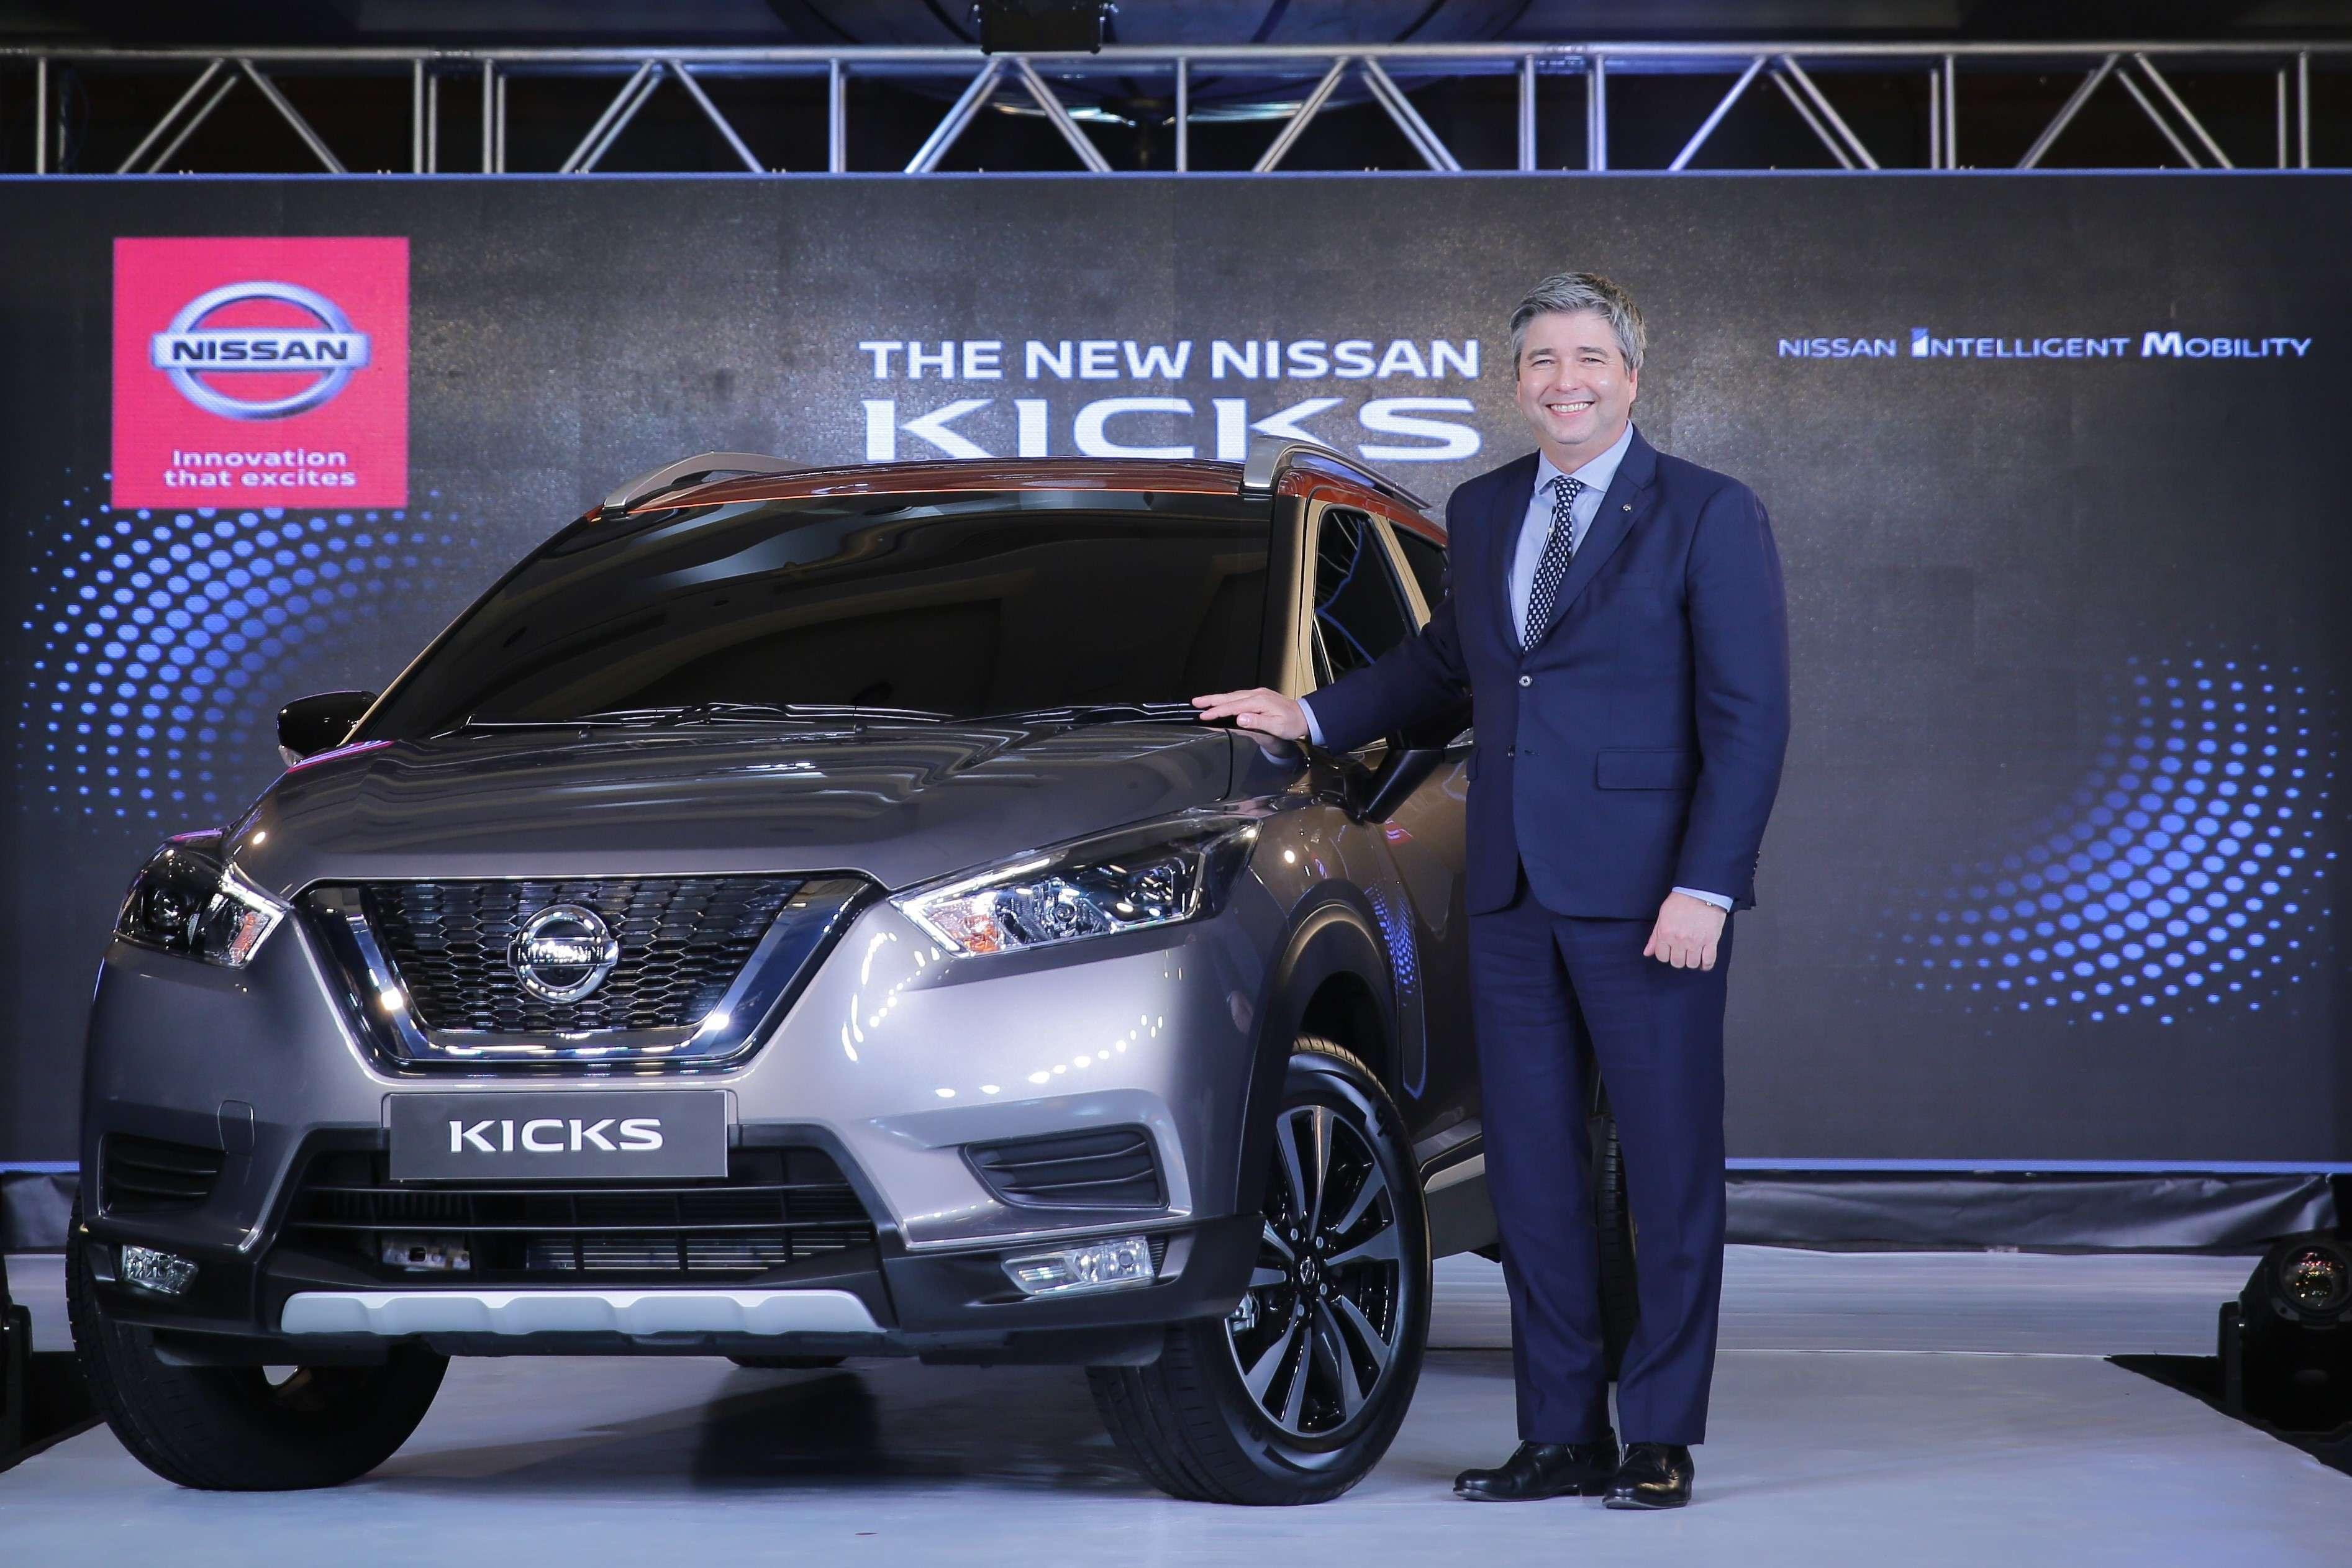 suv kicks: nissan india releases first look of suv kicks, auto news